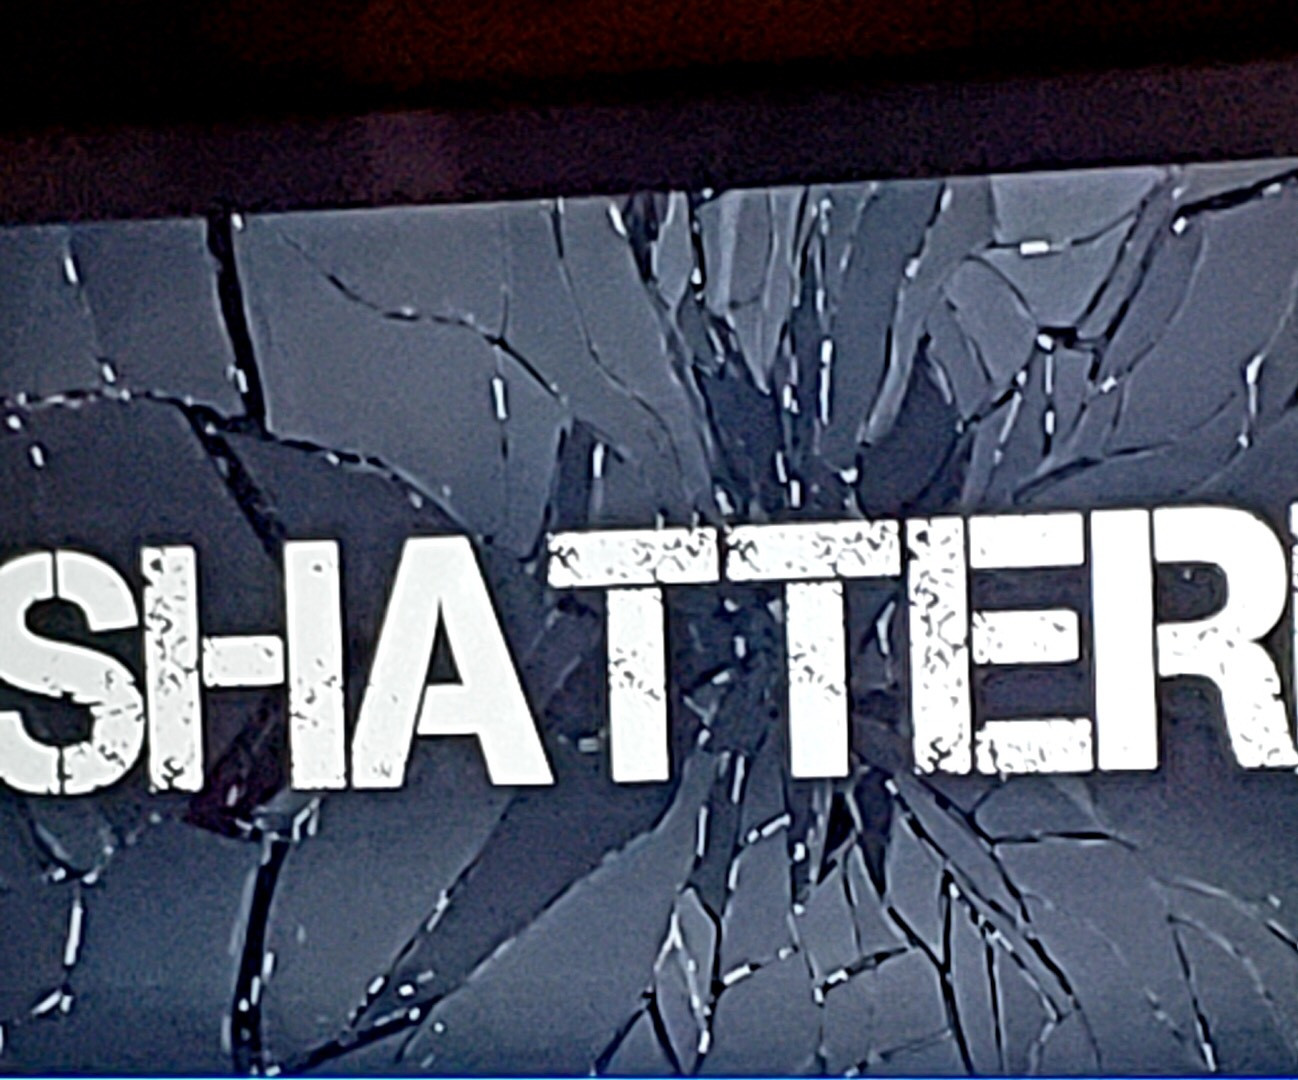 Premier Shatter